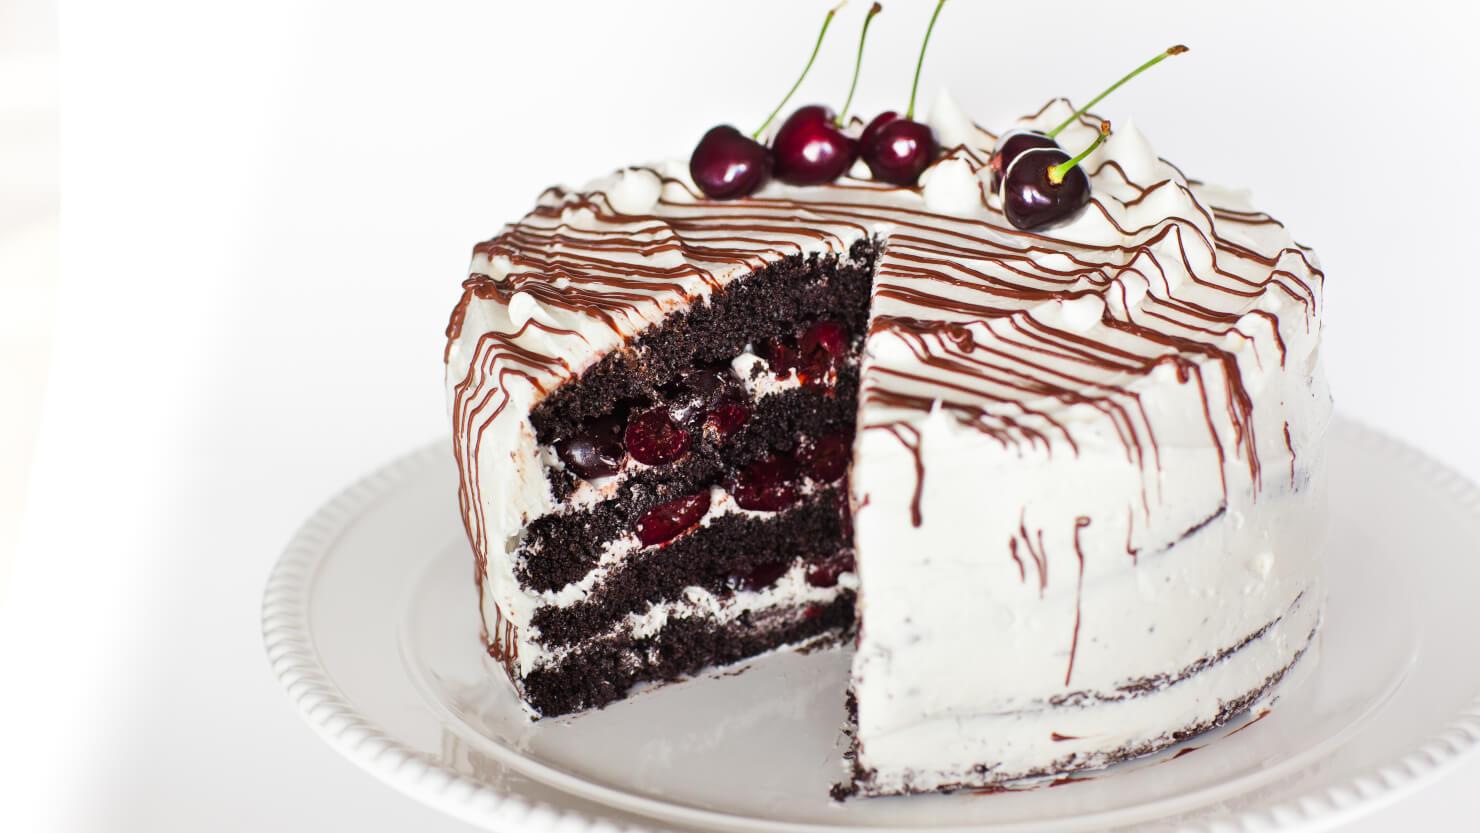 Italian Rum Cake Recipes From Scratch: Chocolate Cherry Rum Cake With Meringue Butter Cream